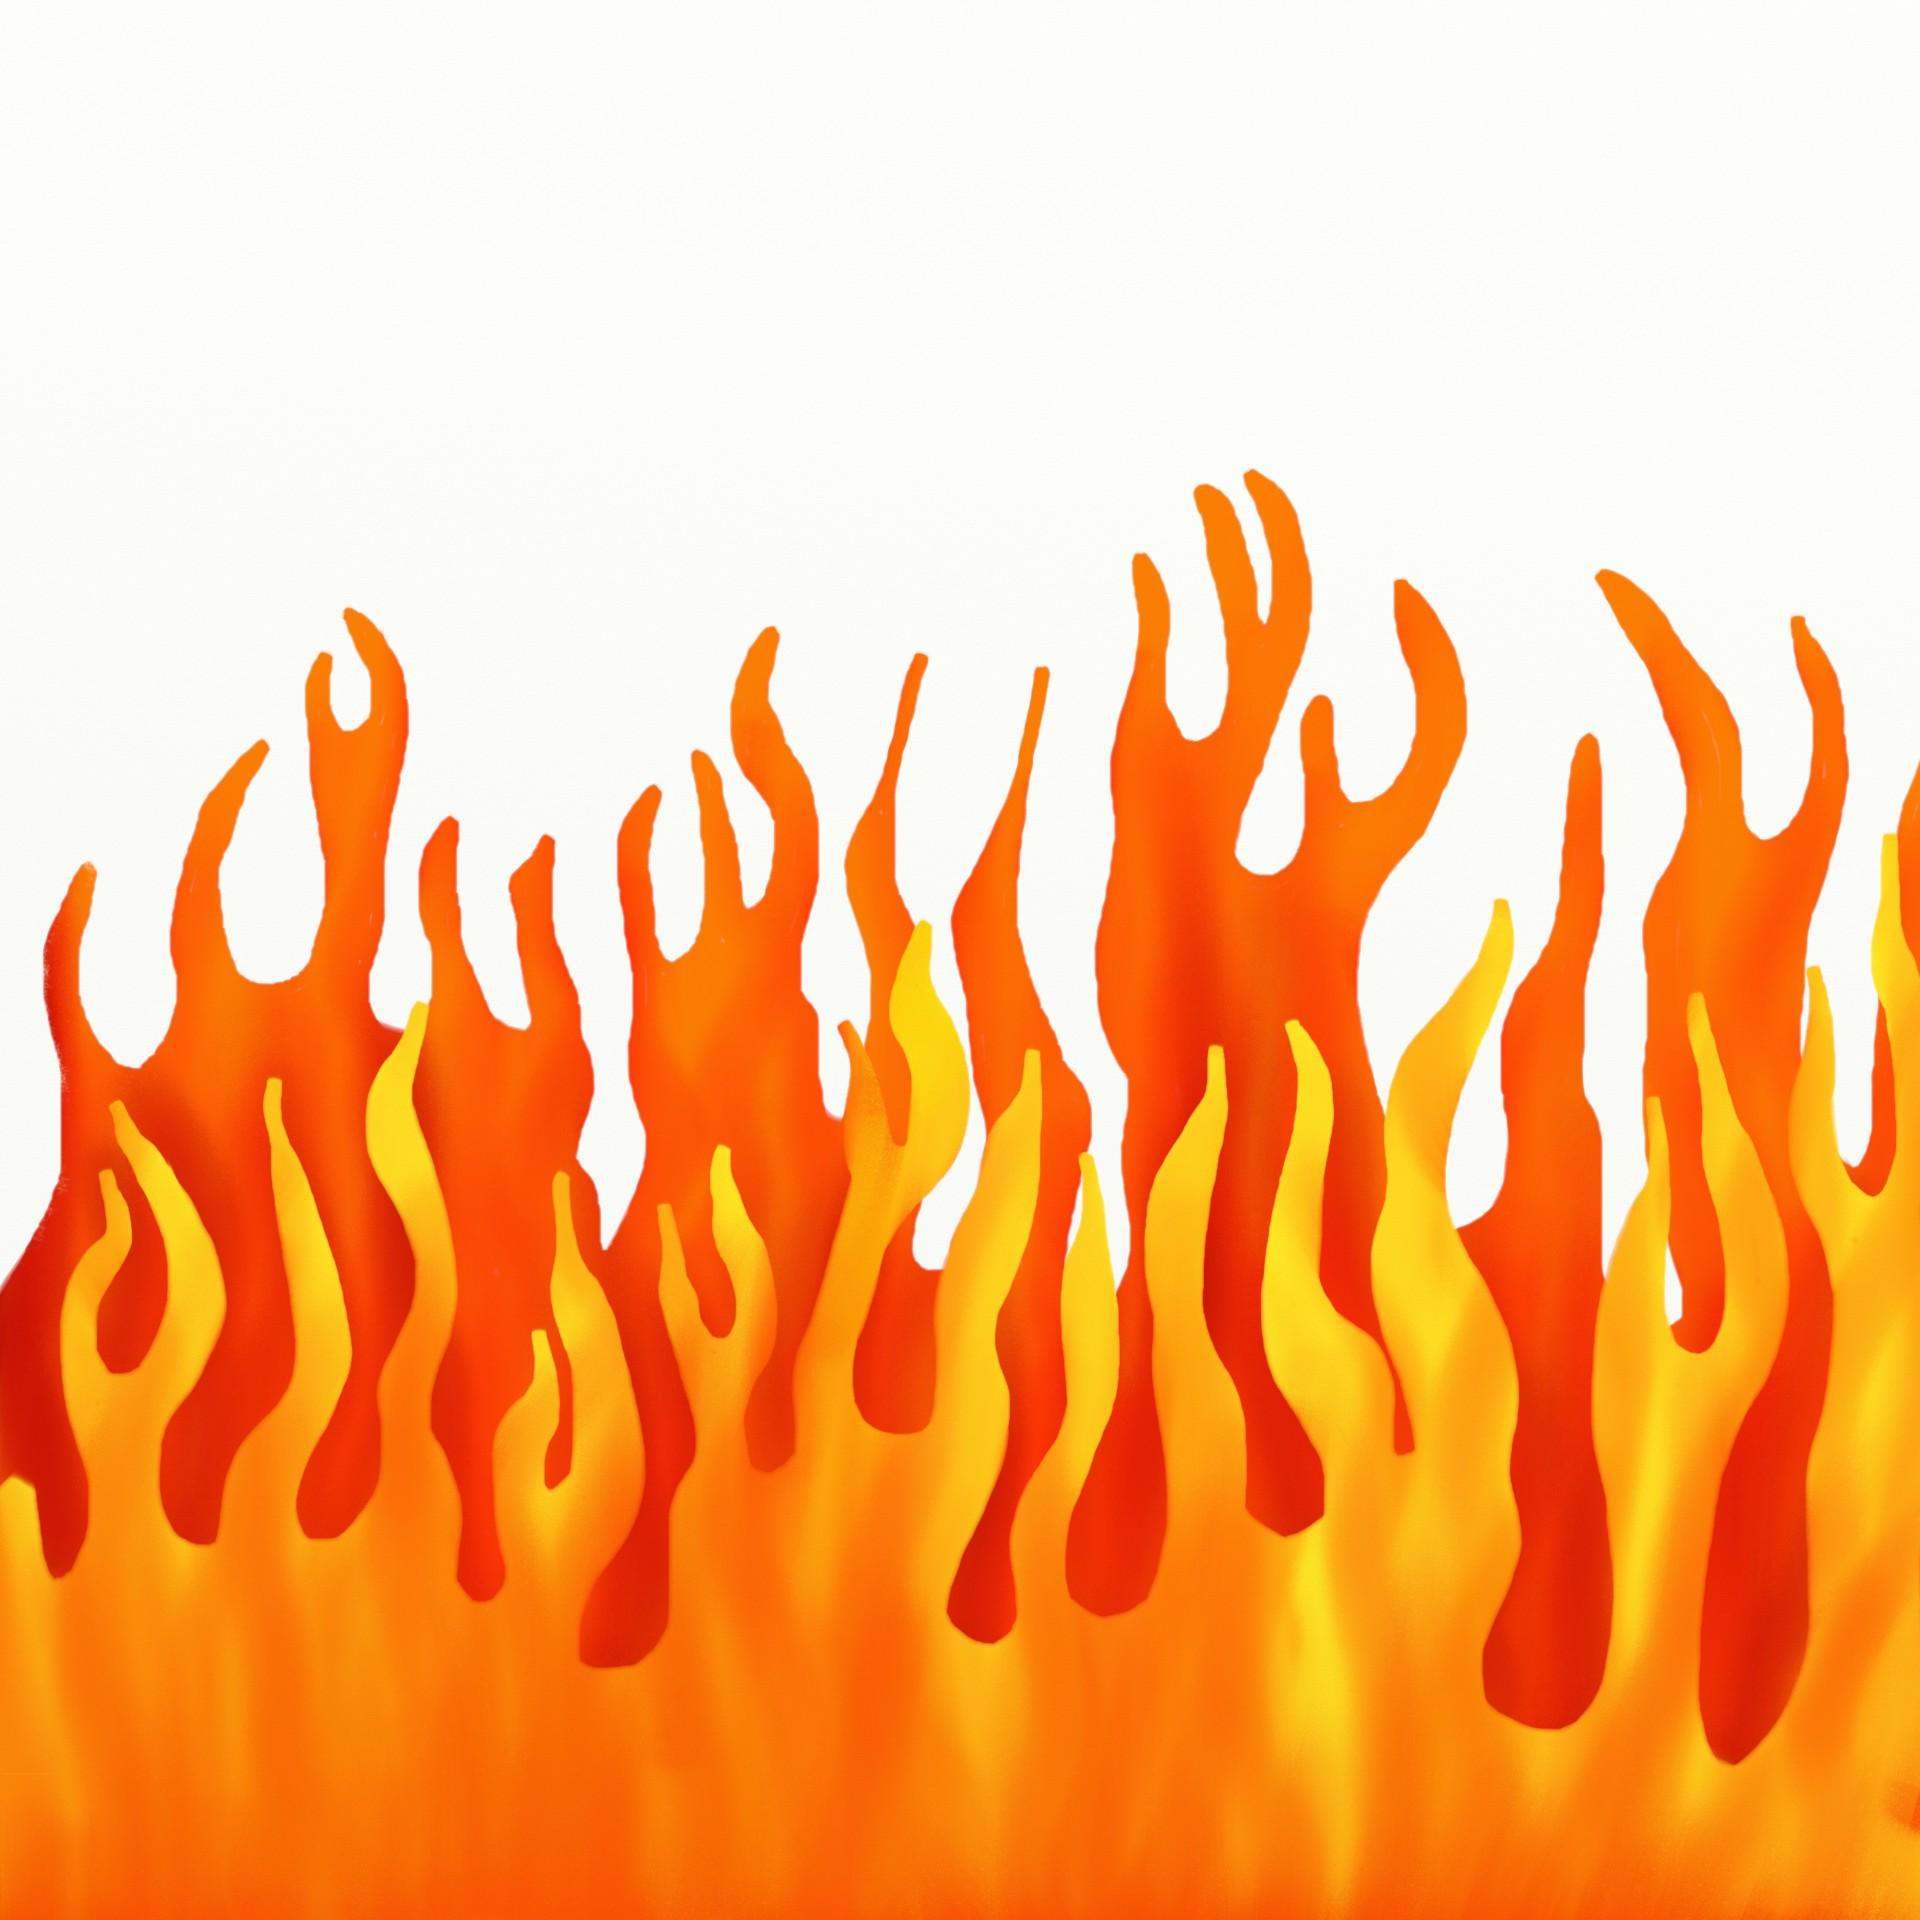 Heat clipart flame Fire Art Public Clip Stock